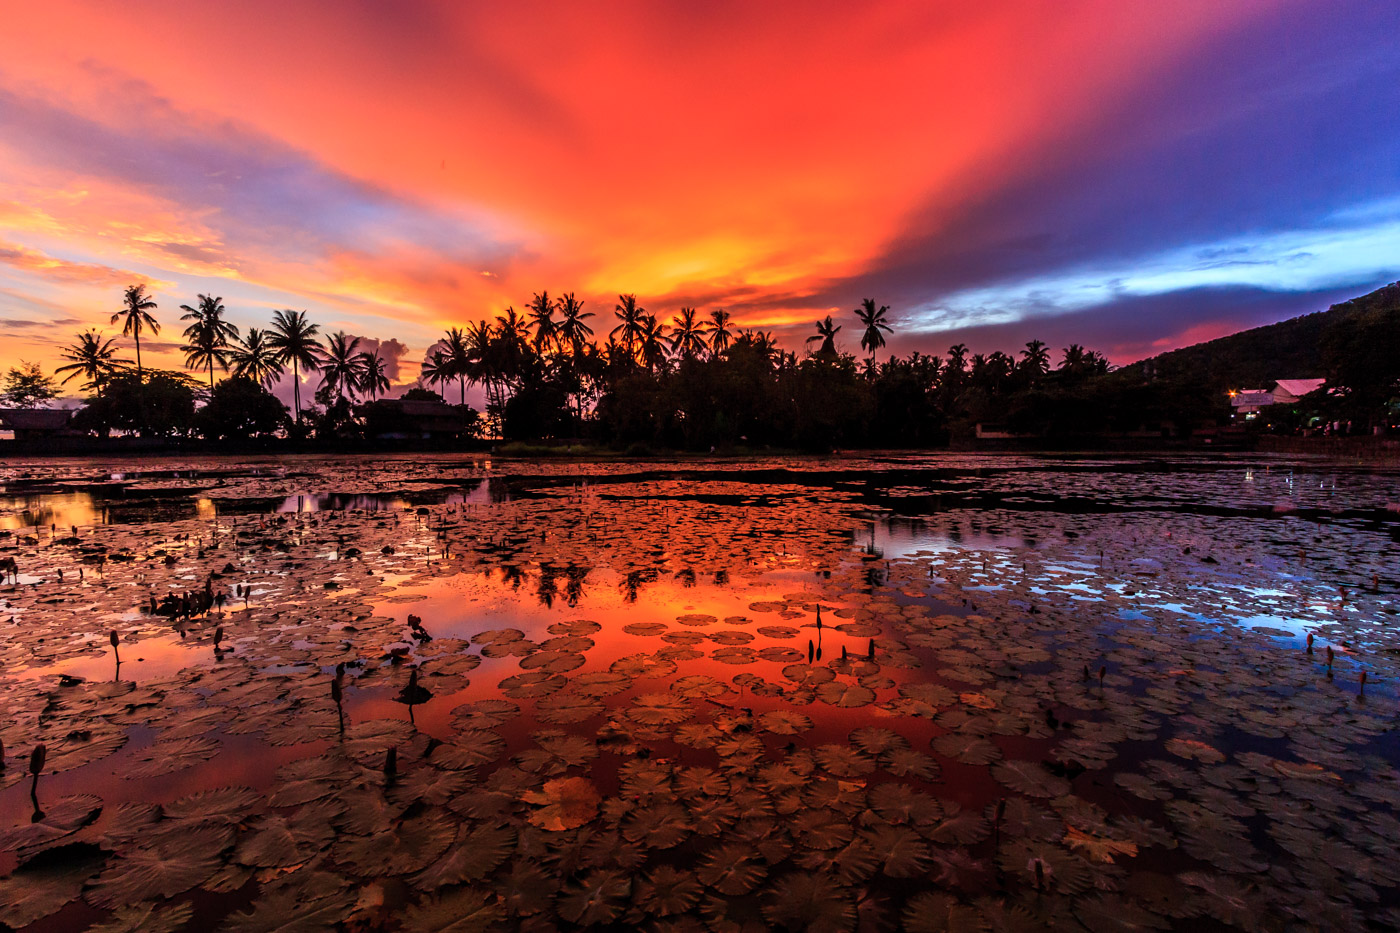 Sunset on the lotus pond.